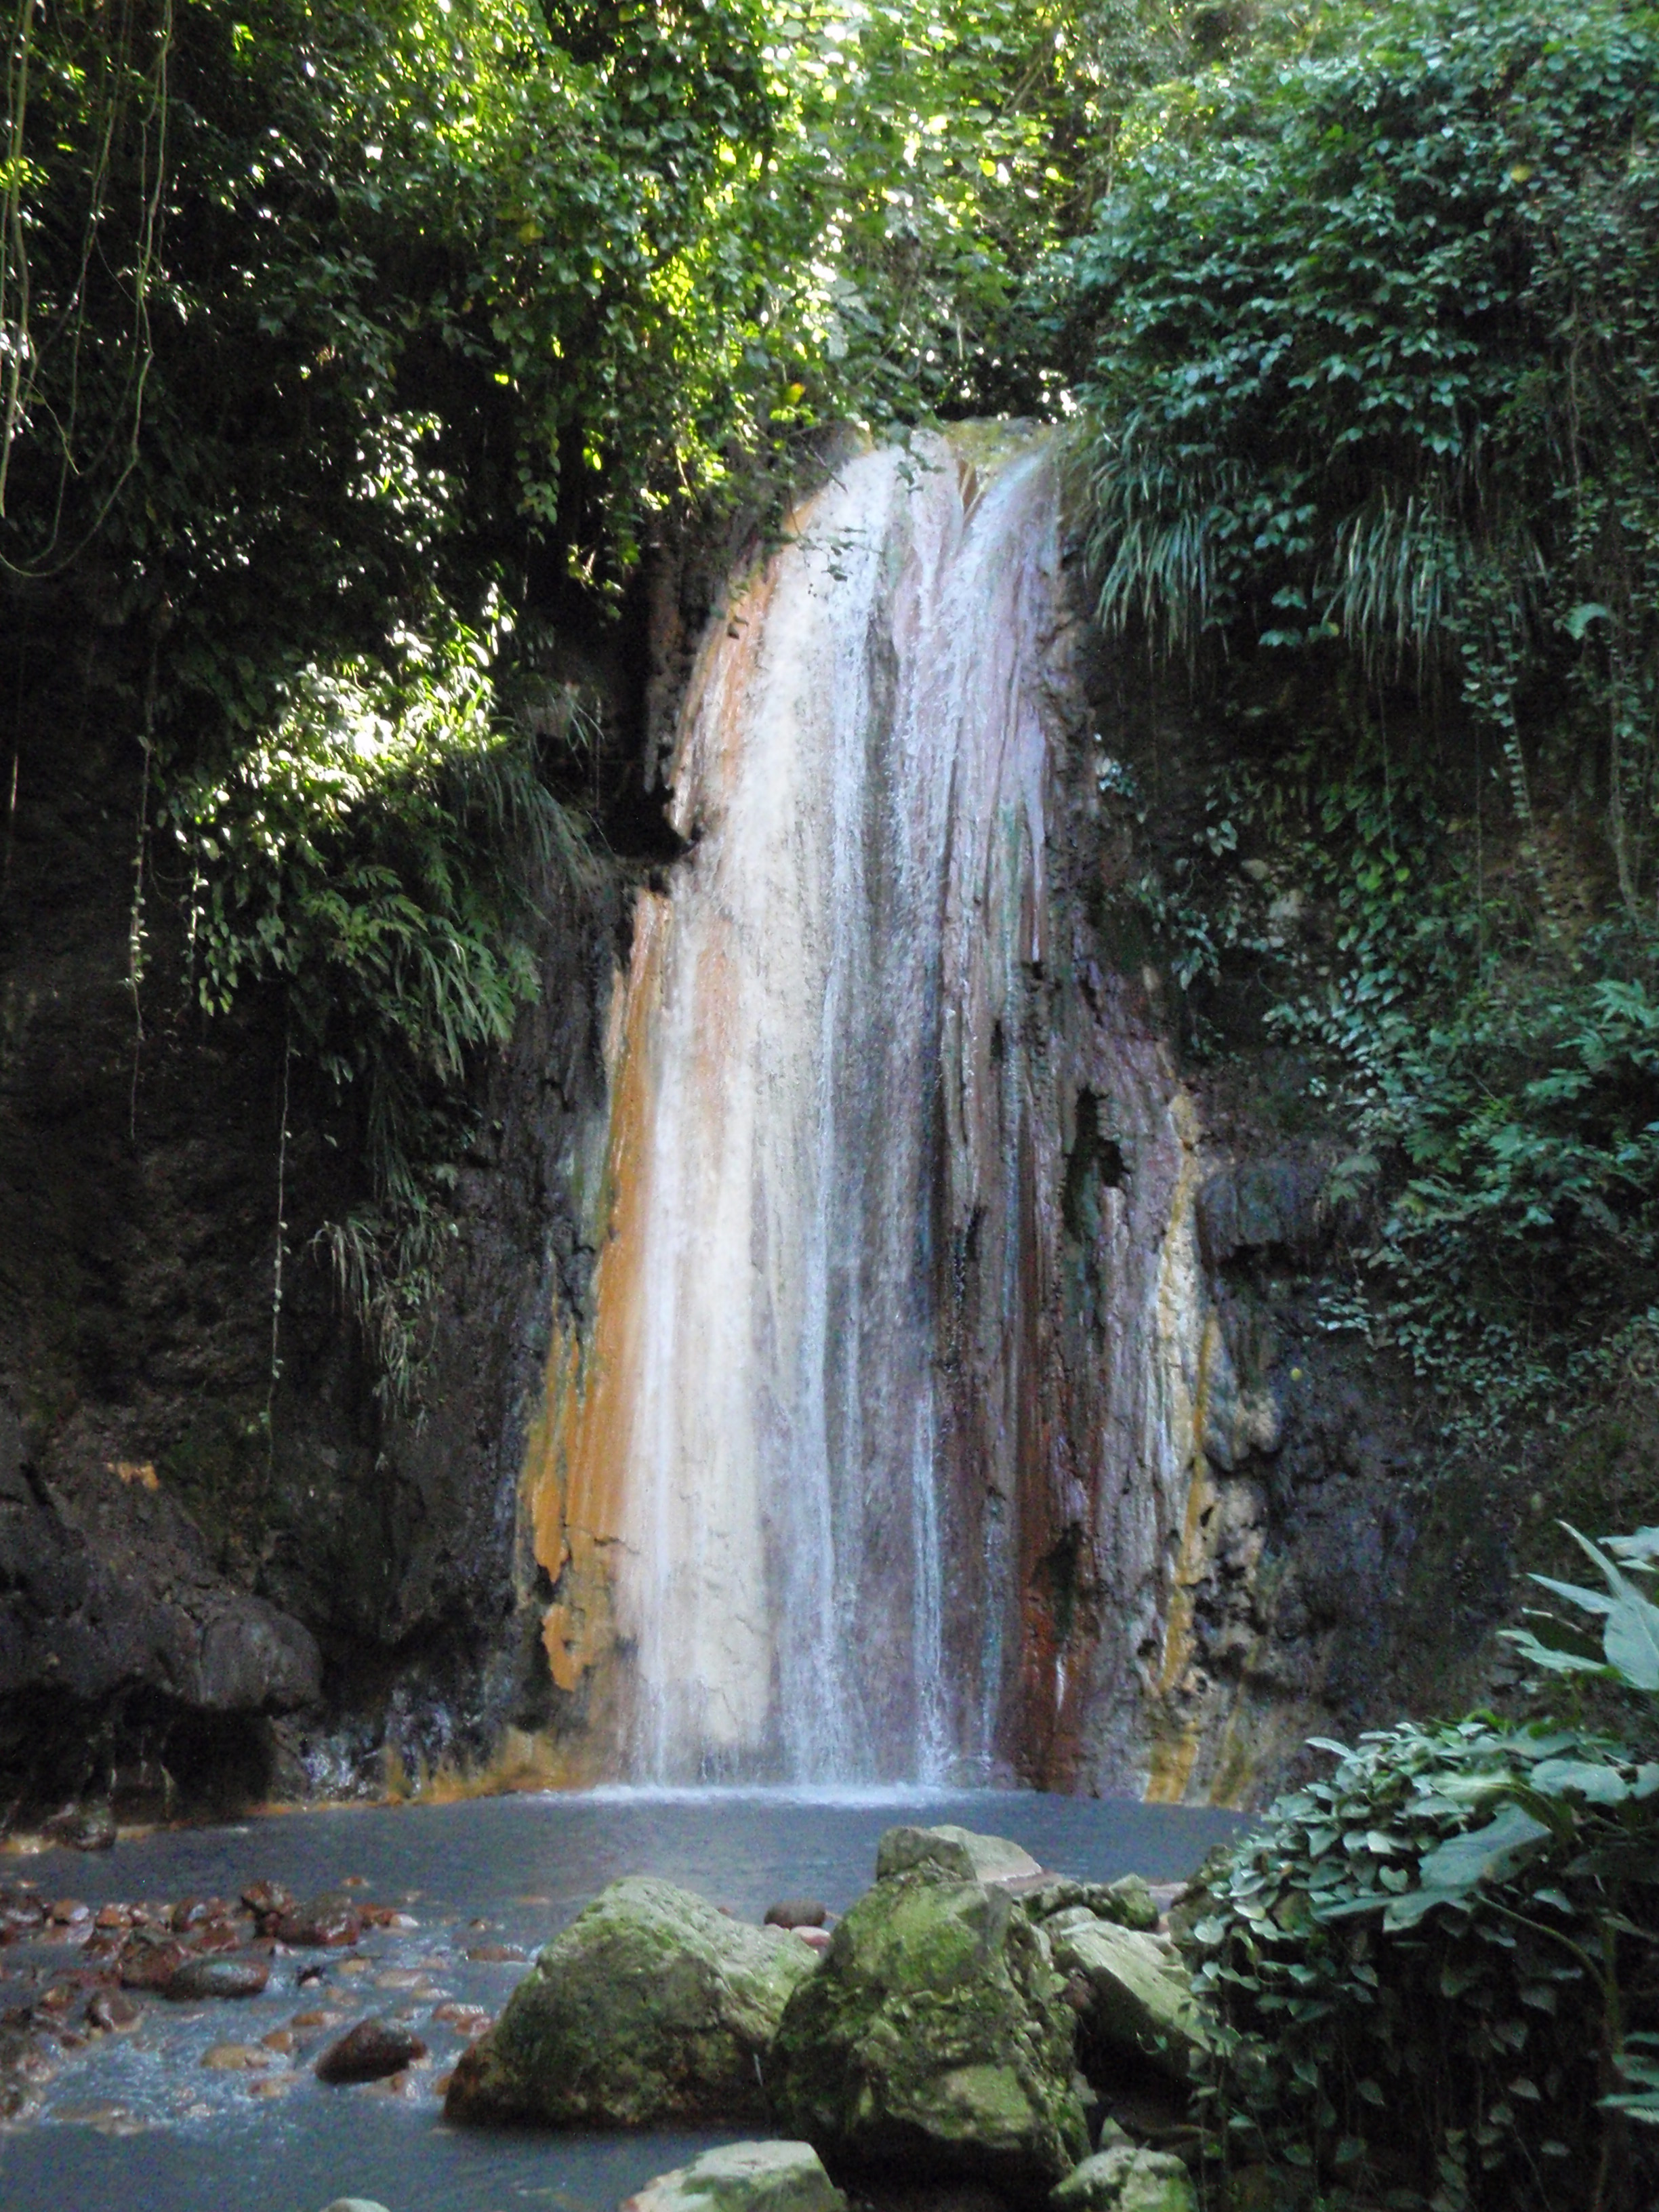 Diamond Falls in Diamond Botanical Gardens, St Lucia #travelclans #stlucia #wanderlust #doyoutravel #travelmore #goexplore #wonderfulplaces #lovetotravel #seekmoments #getoutstayout #beachbum #tropicalisland #lovetheocean #foreversummer